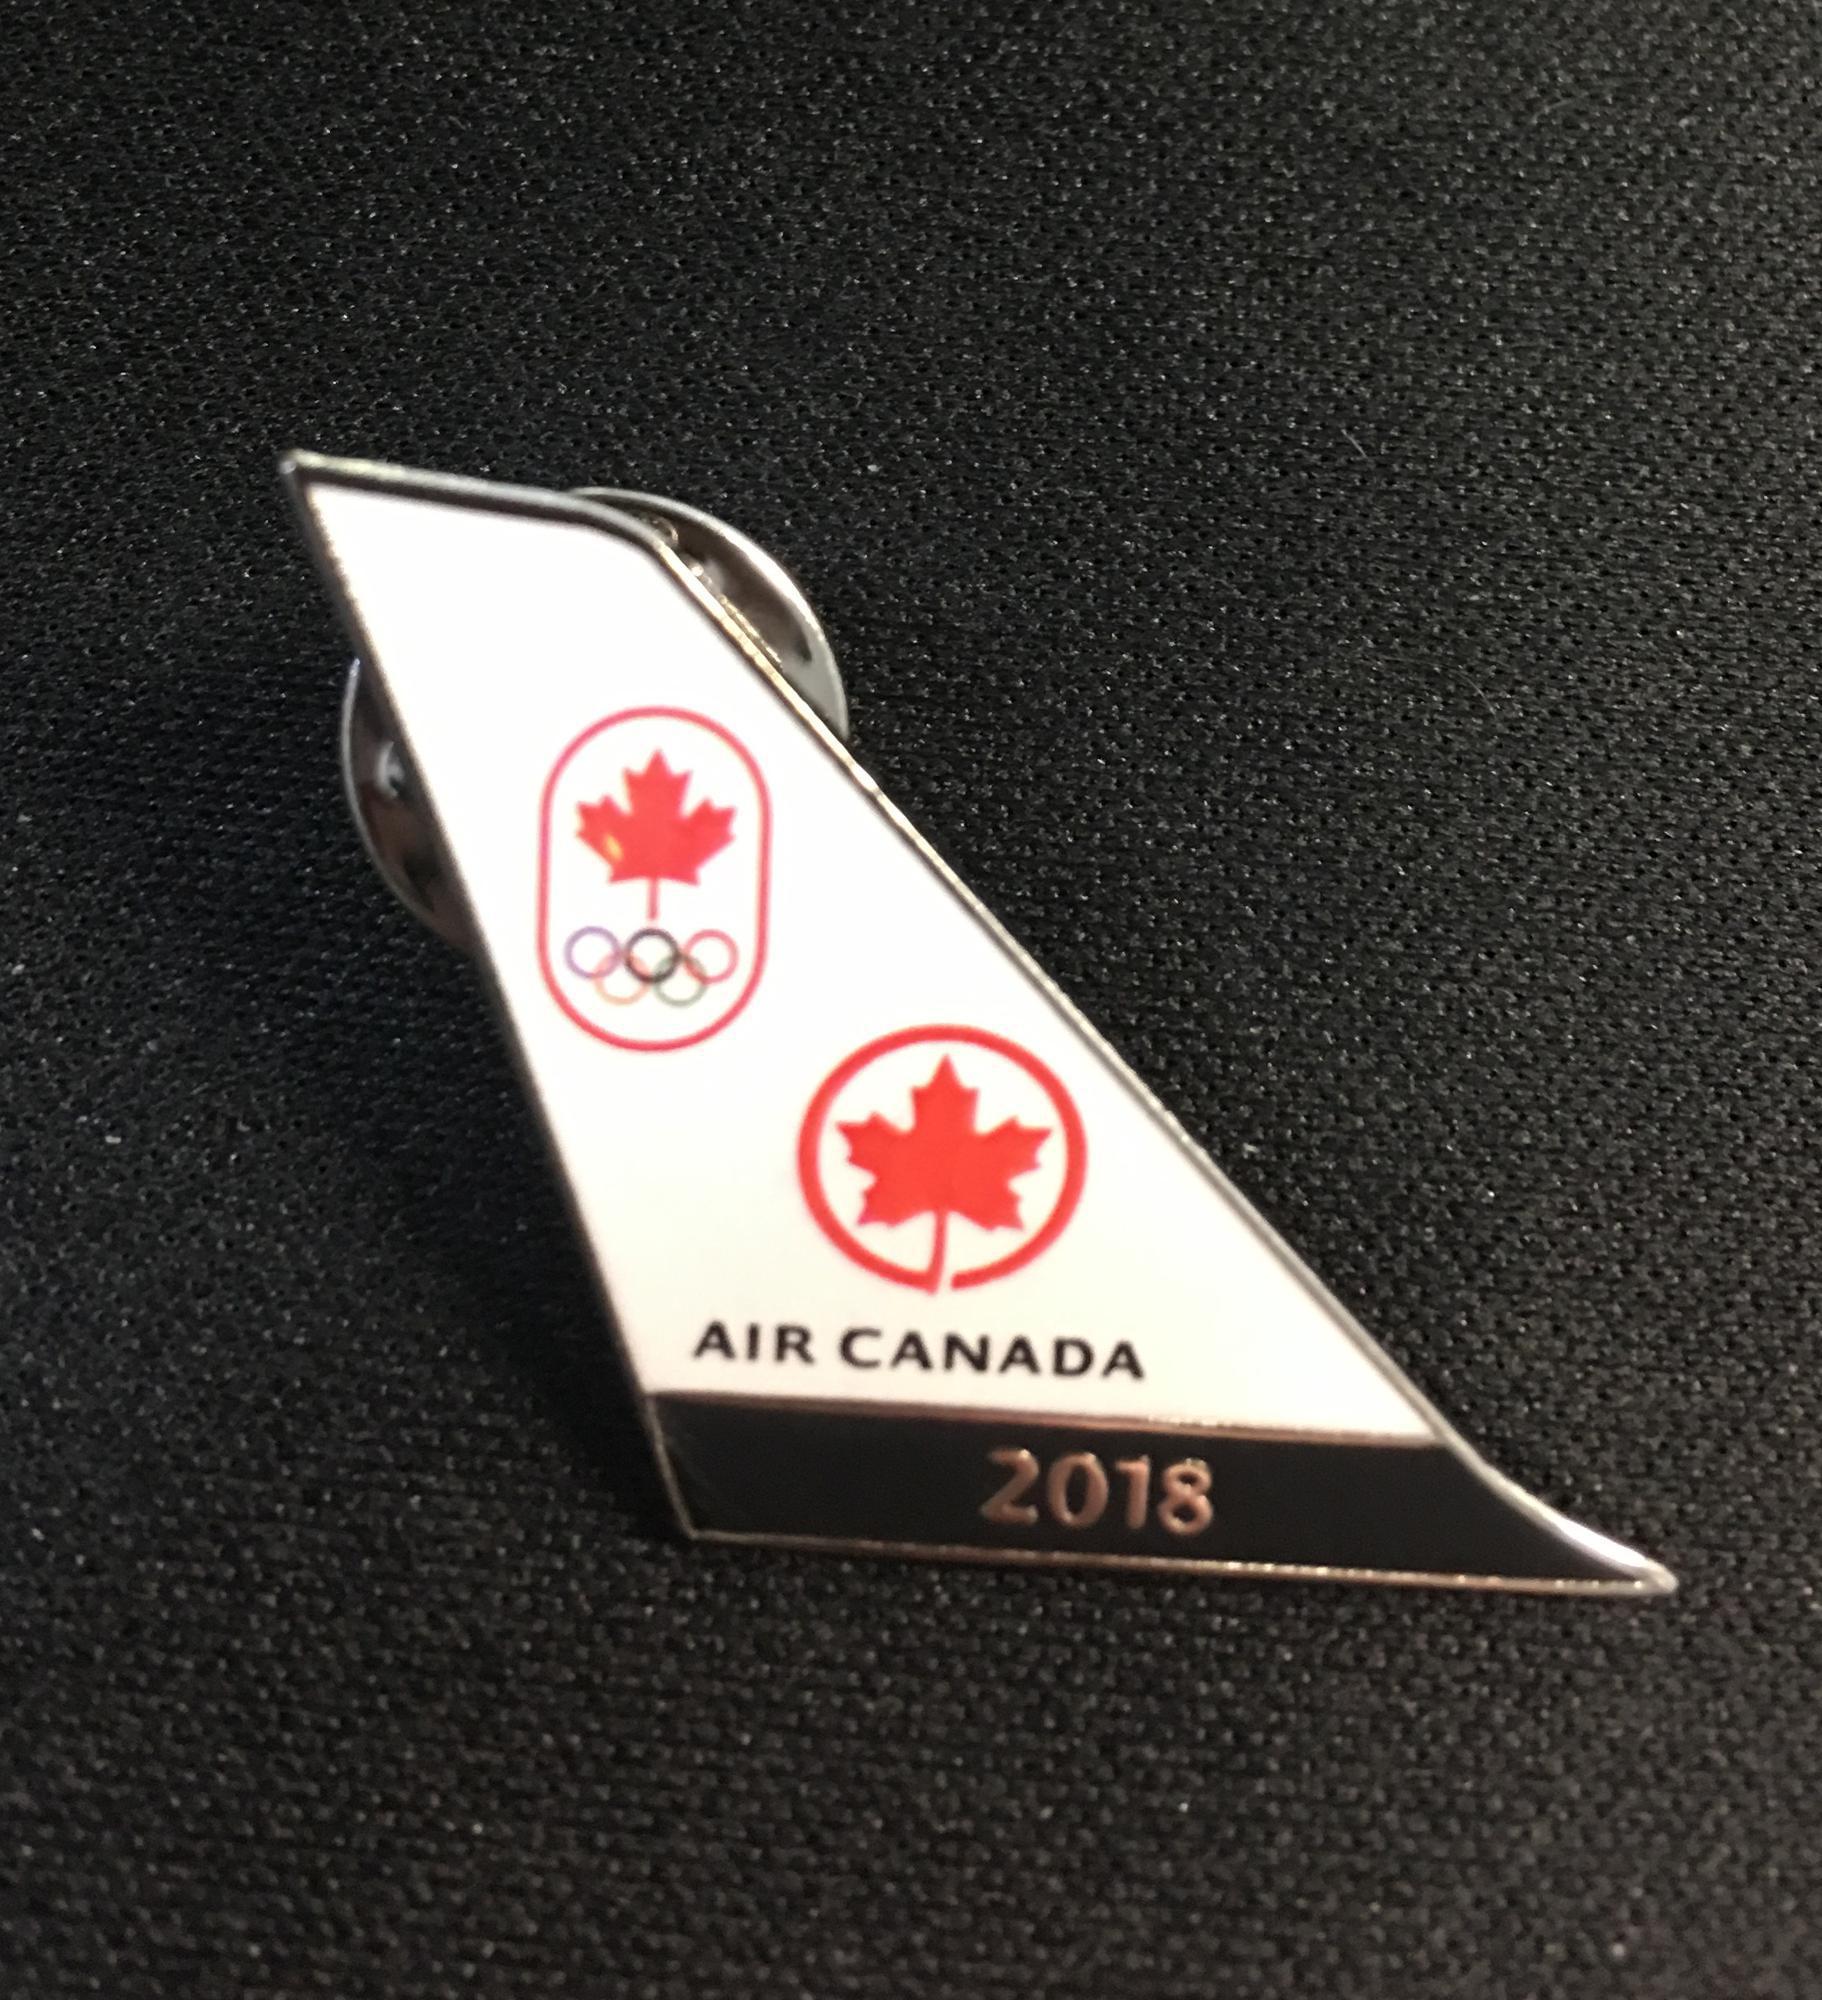 Air Canada Pin 2018 PyeongChang